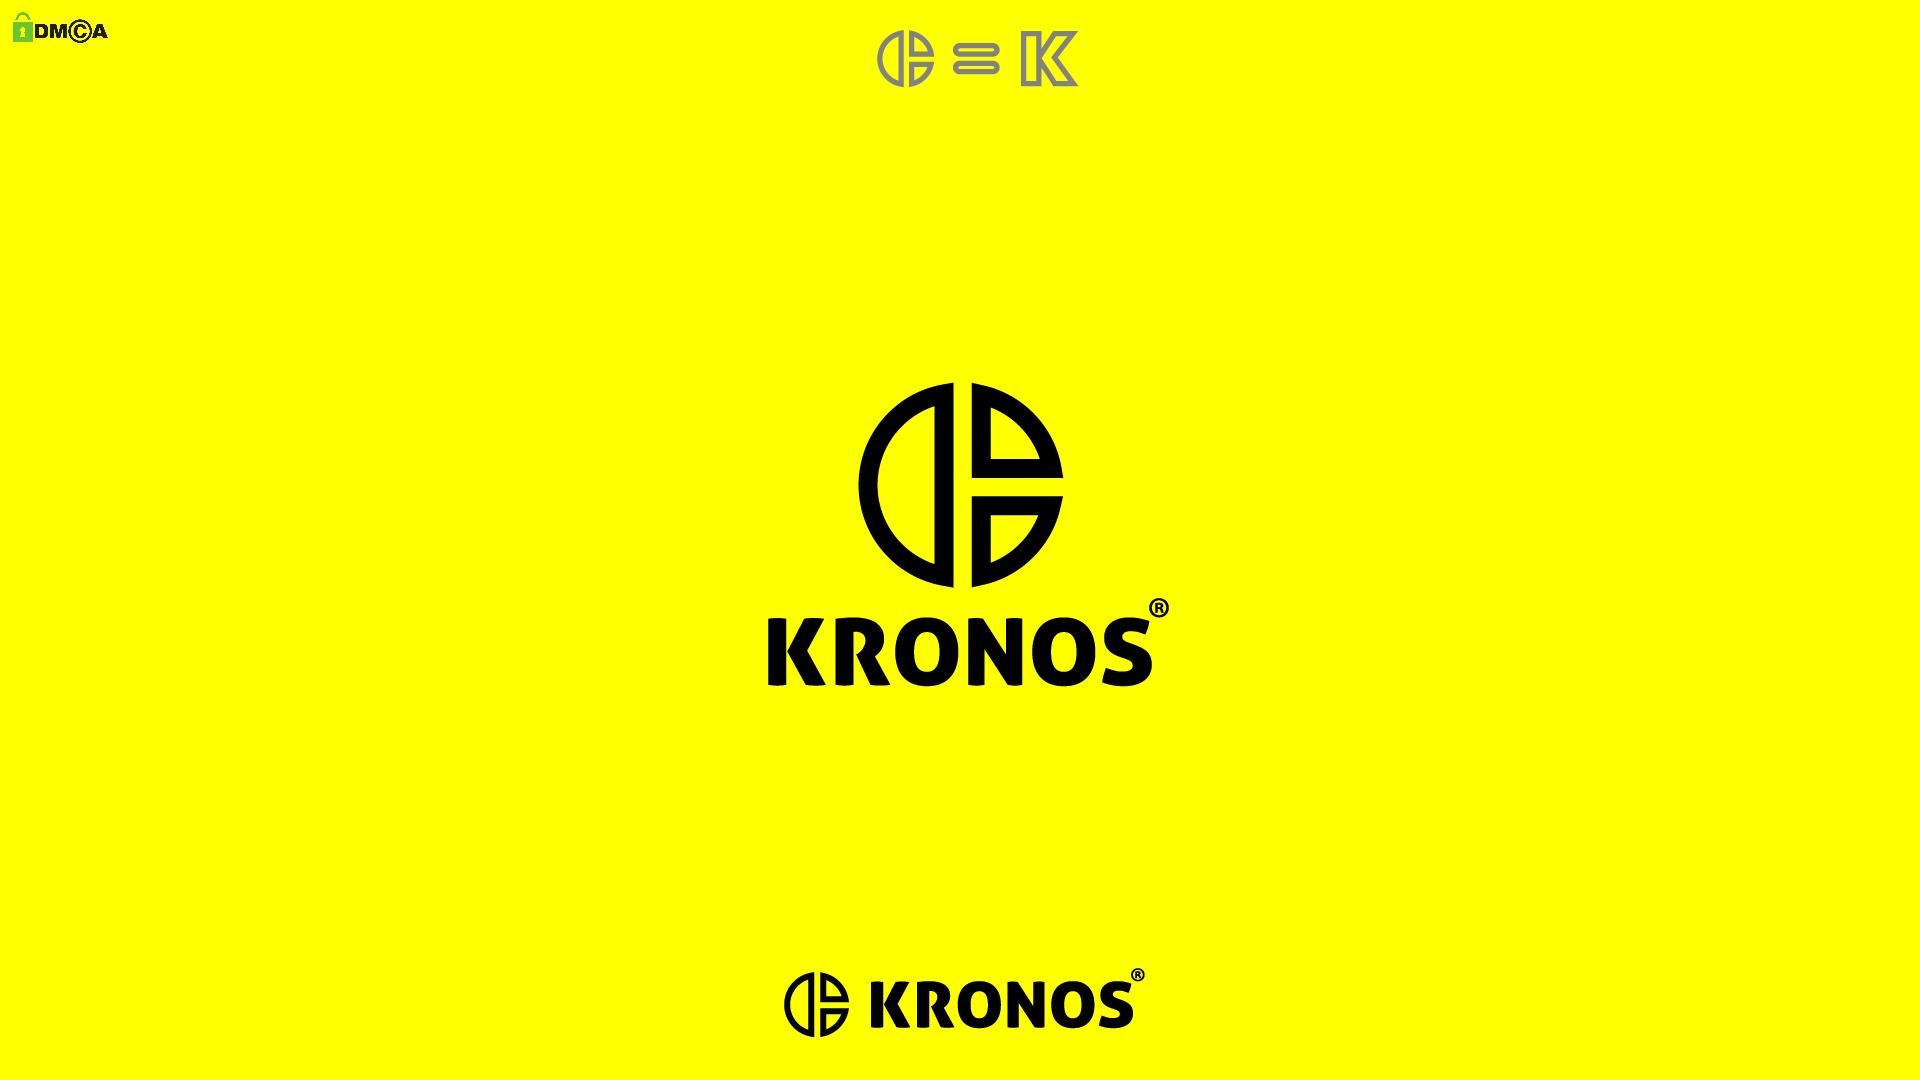 Разработать логотип KRONOS фото f_7395fb1284e5a5b6.jpg